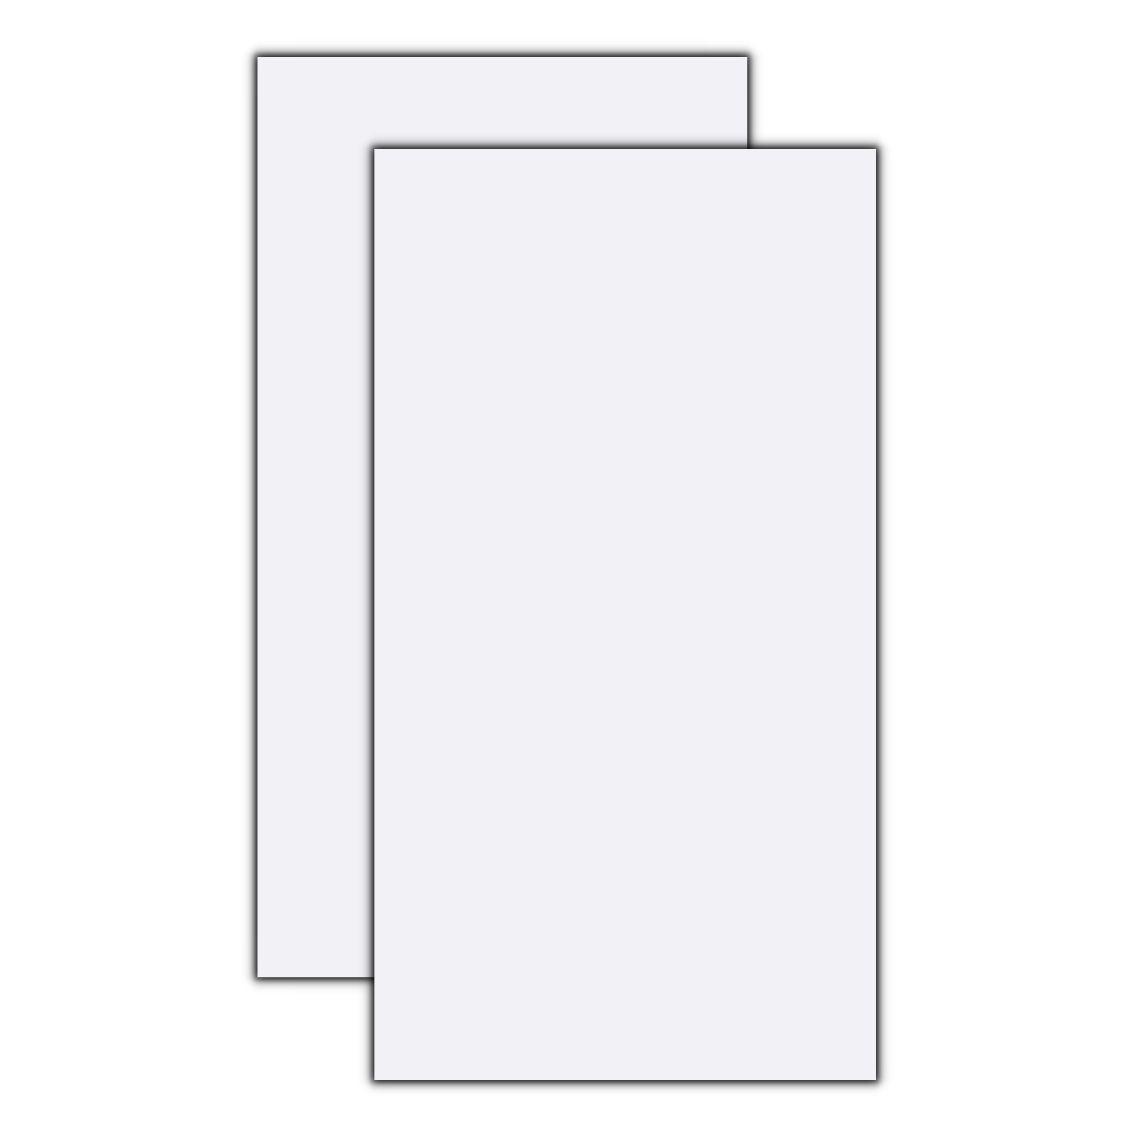 Evidence Bianco 35x70 cm <br /><b>R$ 64,90 M² </b><br />Cx 1,96 M² <b> R$ 127,20</b>